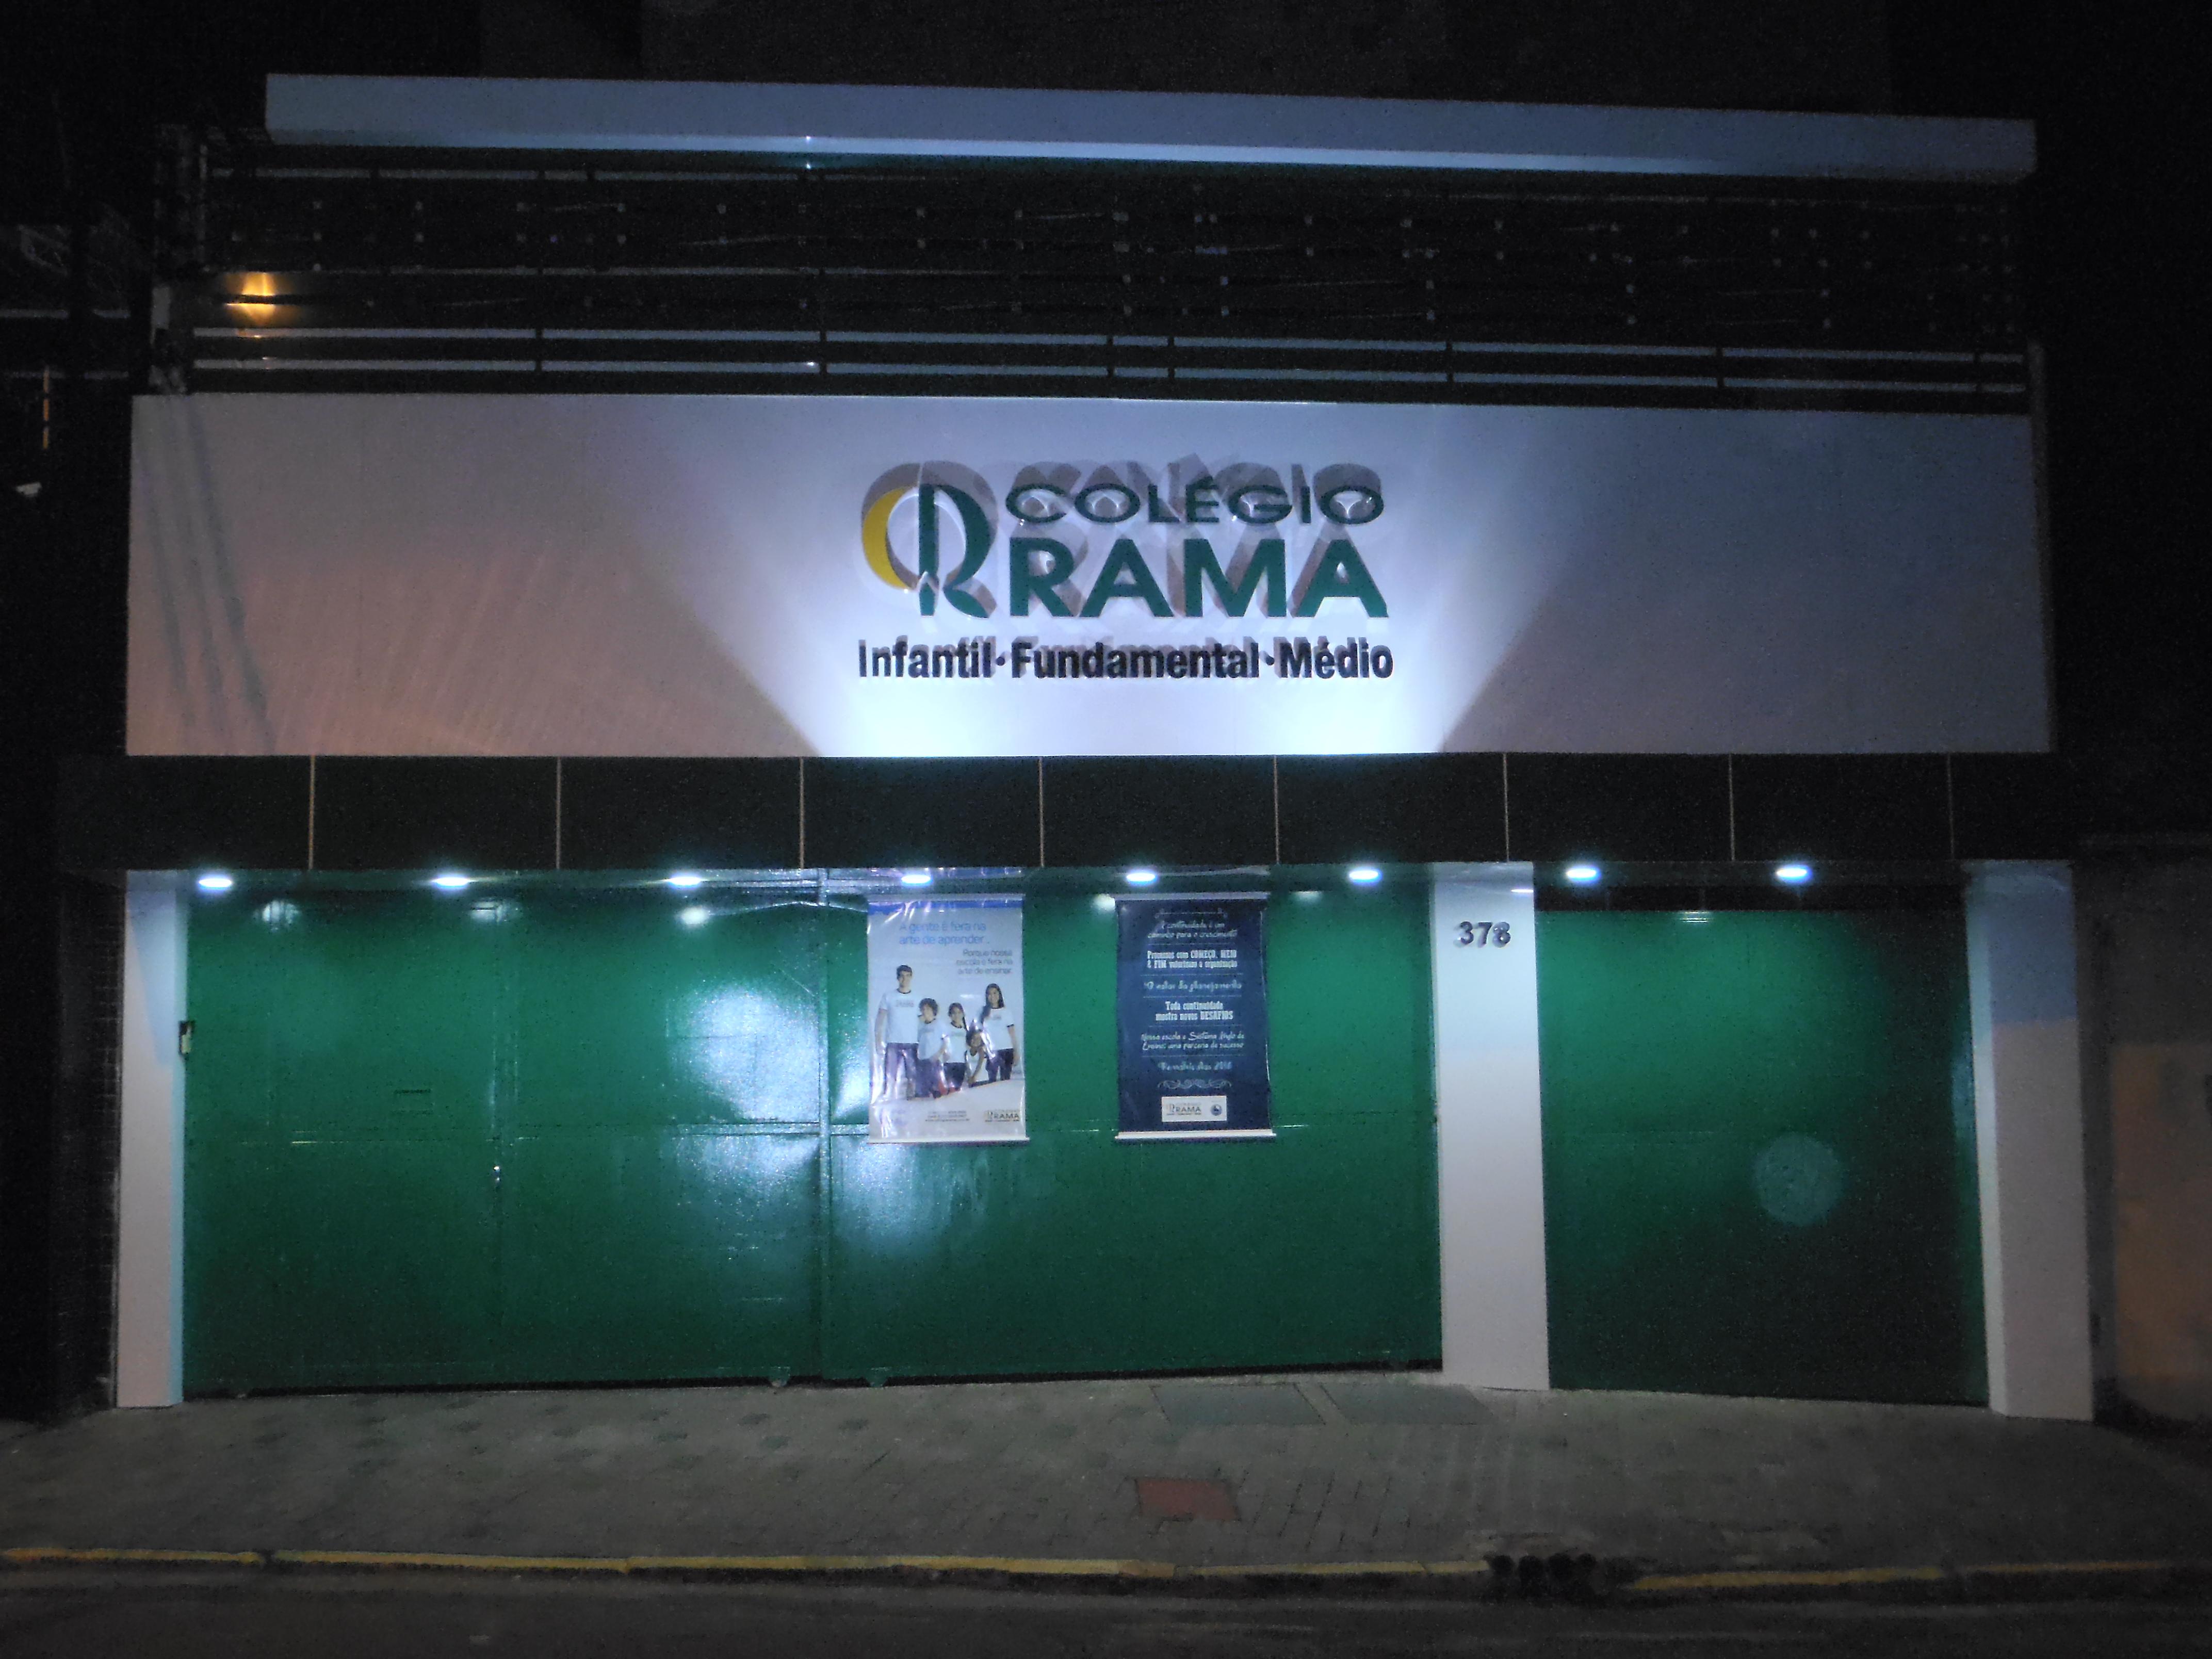 Colegio Rama Penha São Paulo